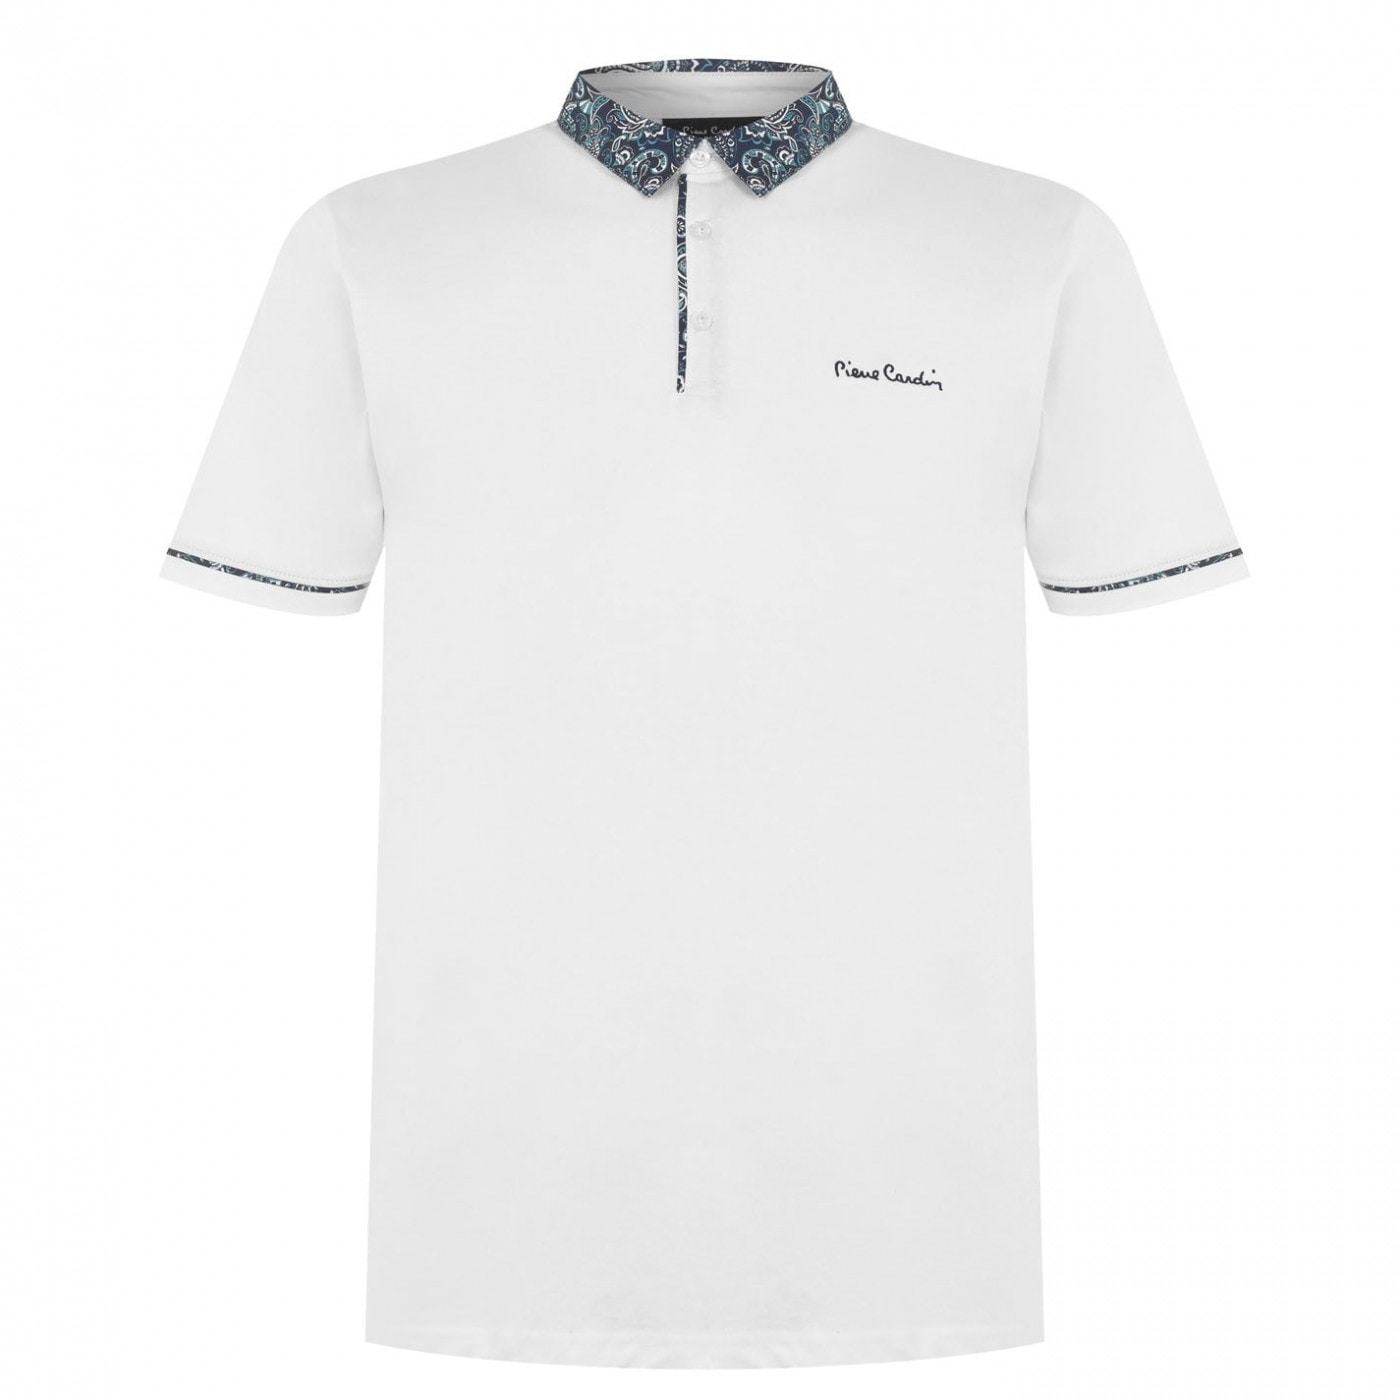 Men's Polo shirt Pierre Cardin 54350222